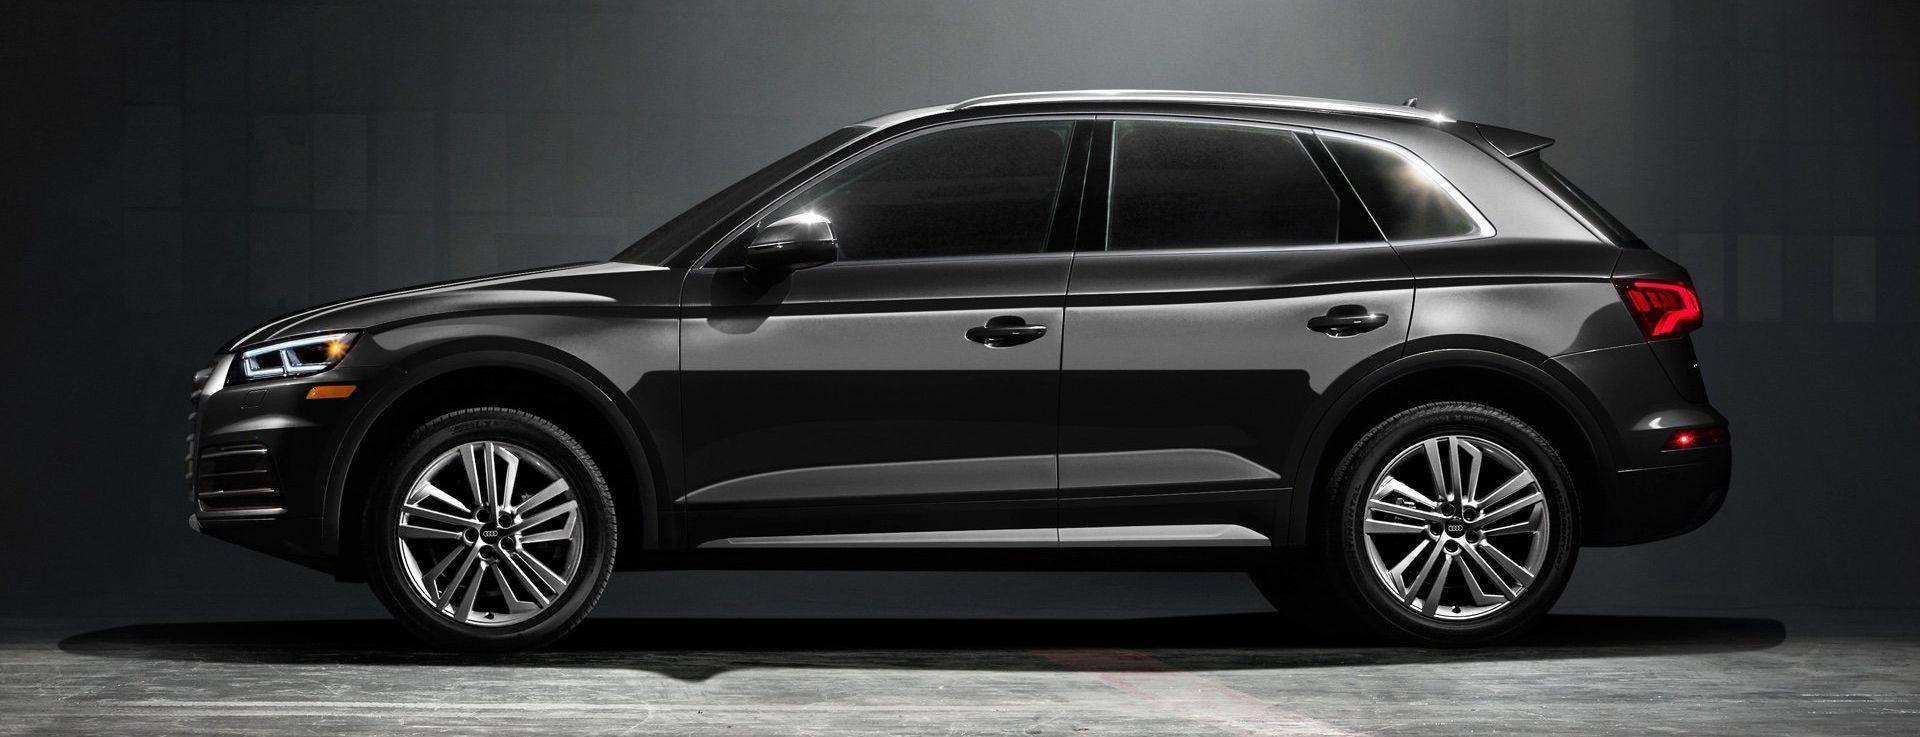 Audi Q For Sale Near Lakeway TX Audi North Austin - Audi q5 for sale